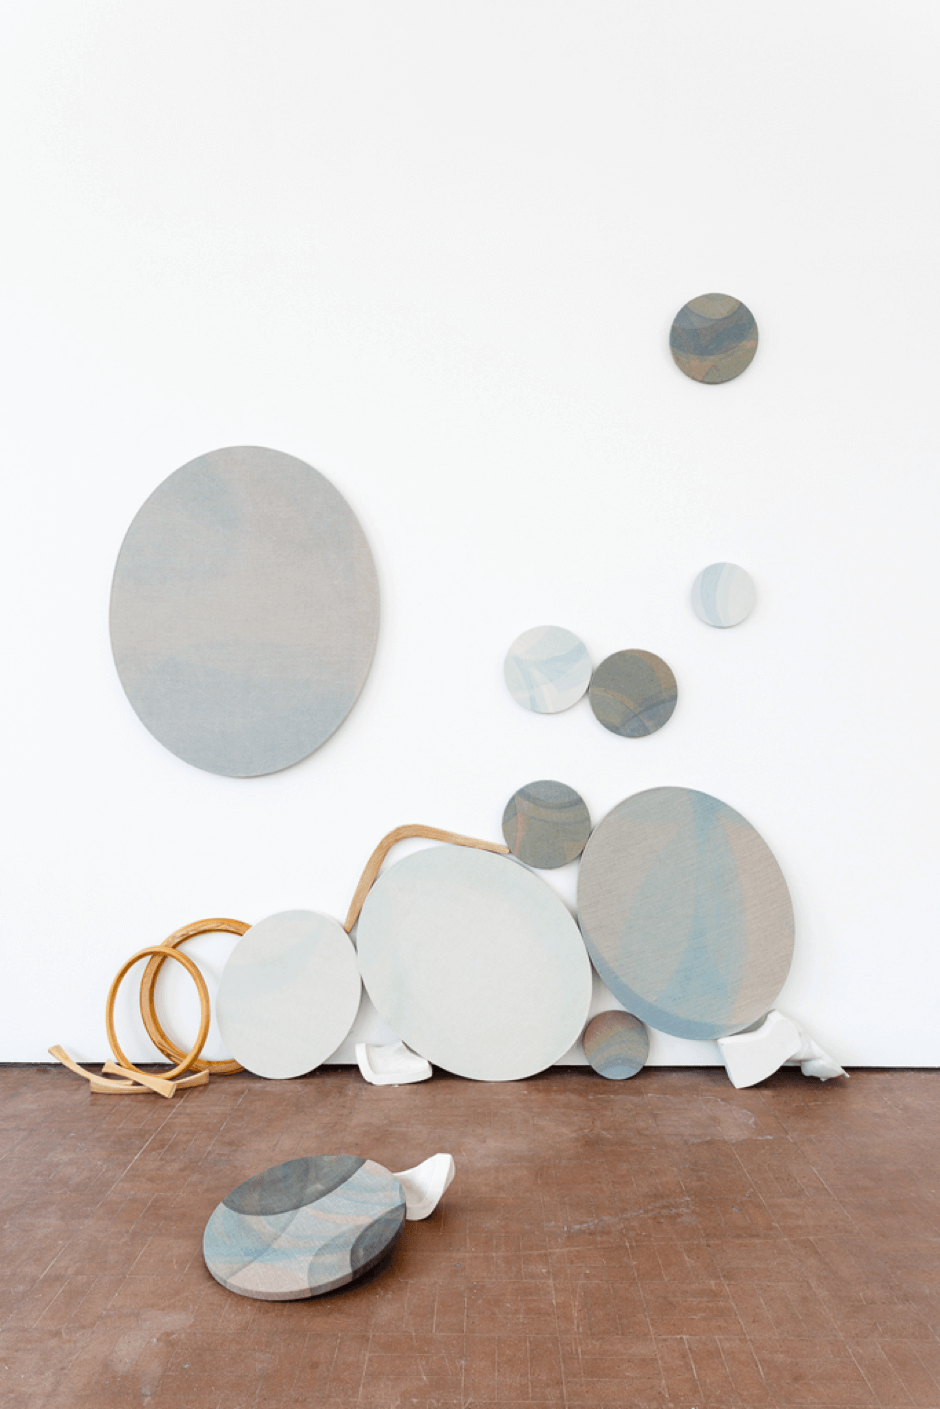 Yelena Popova, After image Installation View, Nottingham Contemporary 2016